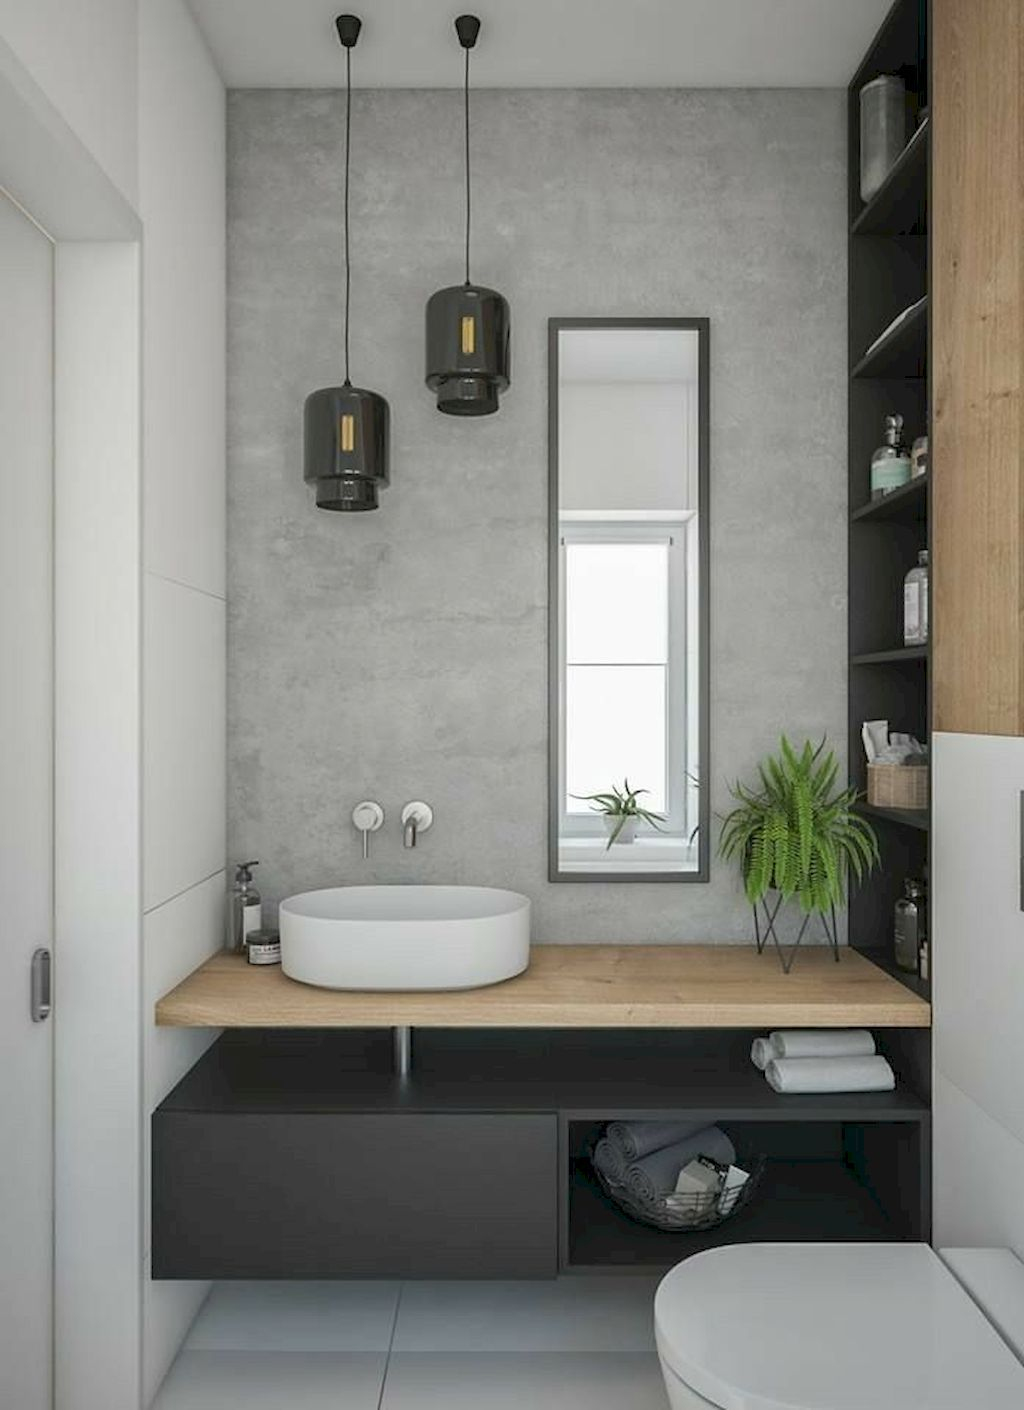 Implausible Modern Bathroom Design Https Crithome Com Modern Bathroom Design Modern Bathroom Des Small Bathroom Remodel Small Bathroom Modern Bathroom